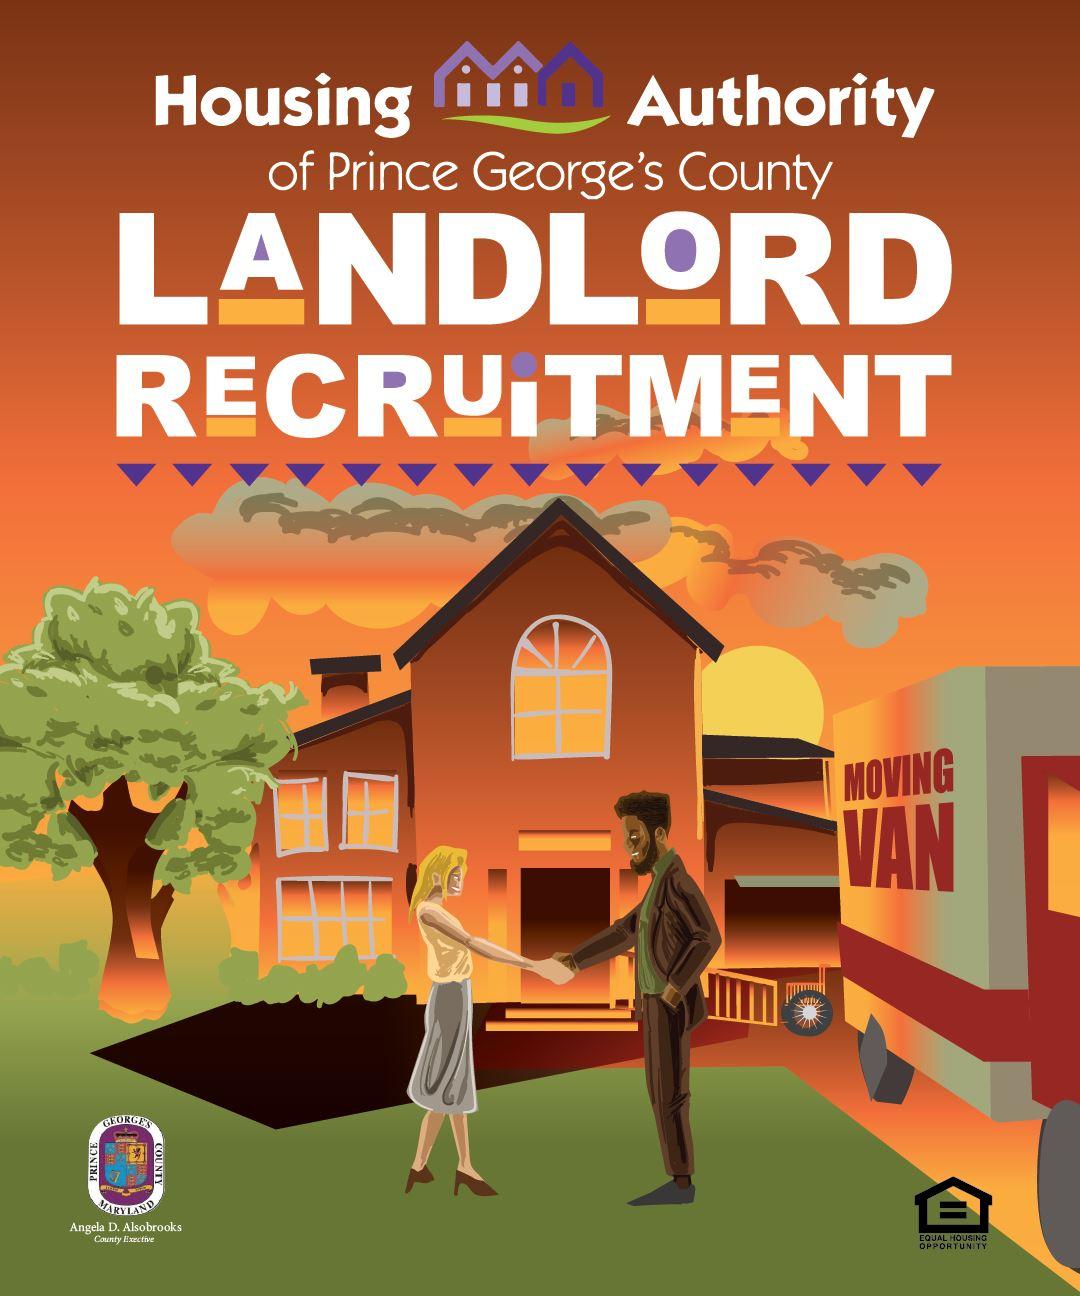 Landlord Recruitment Social-Media Image